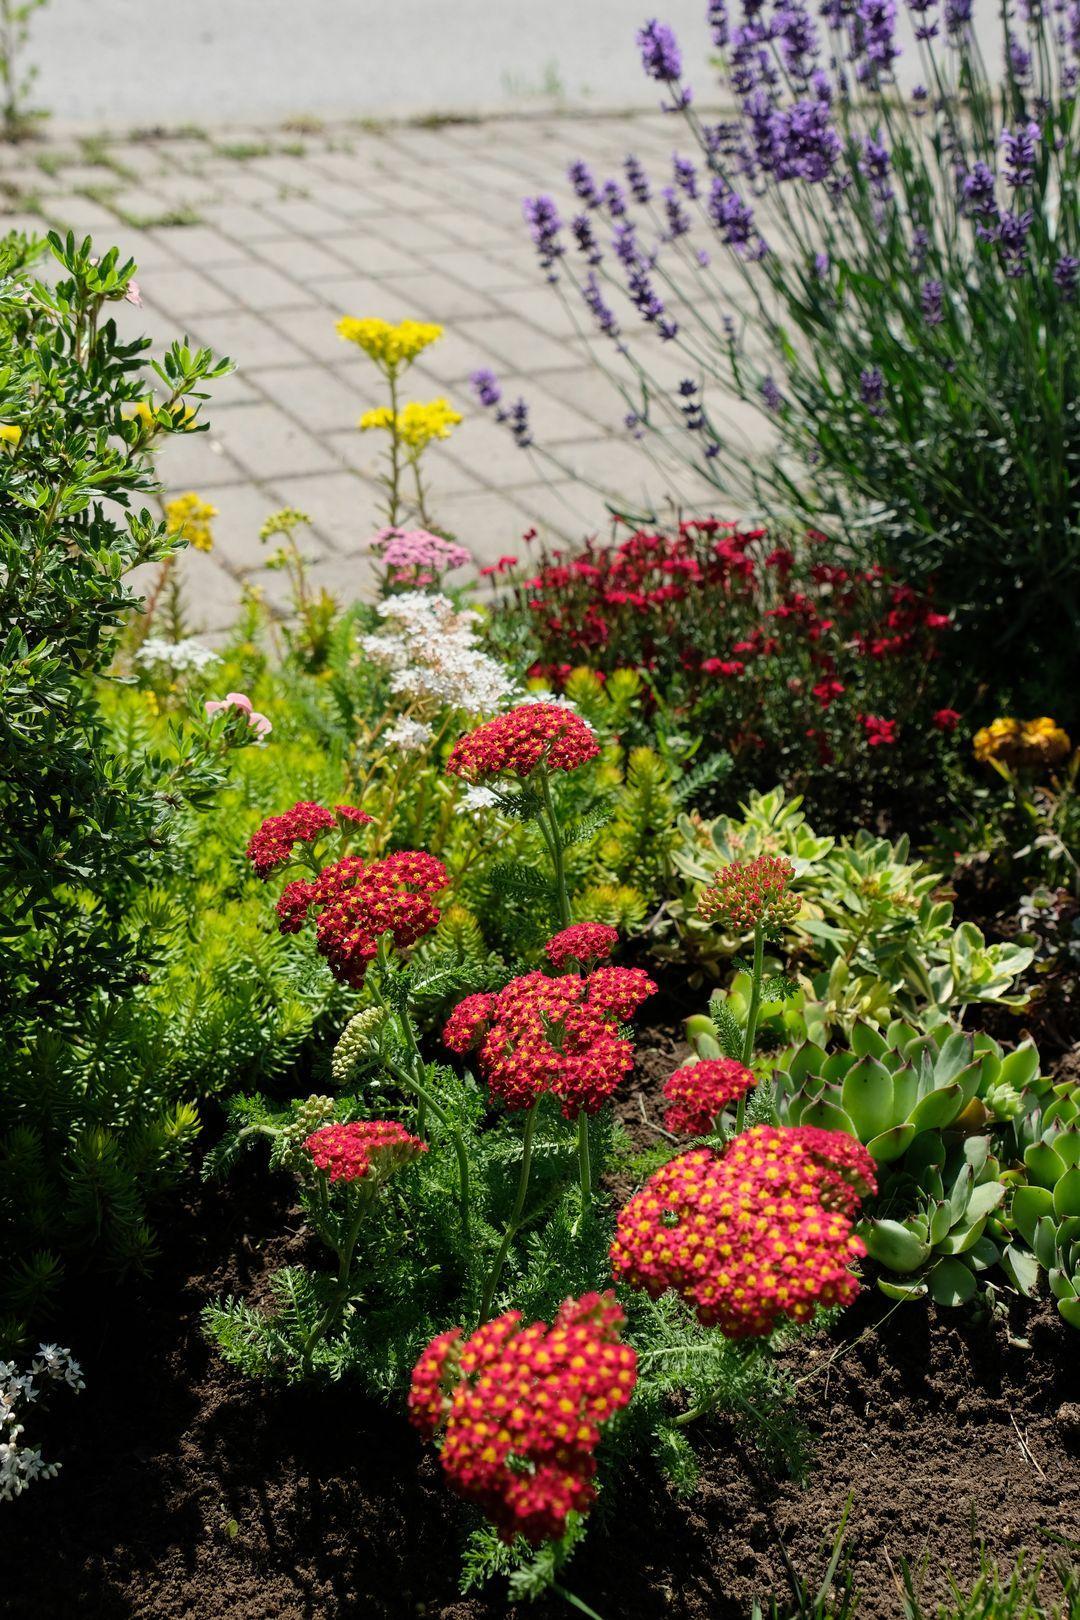 Naša záhradka 2020 - Este raz novy cerveny rebricek